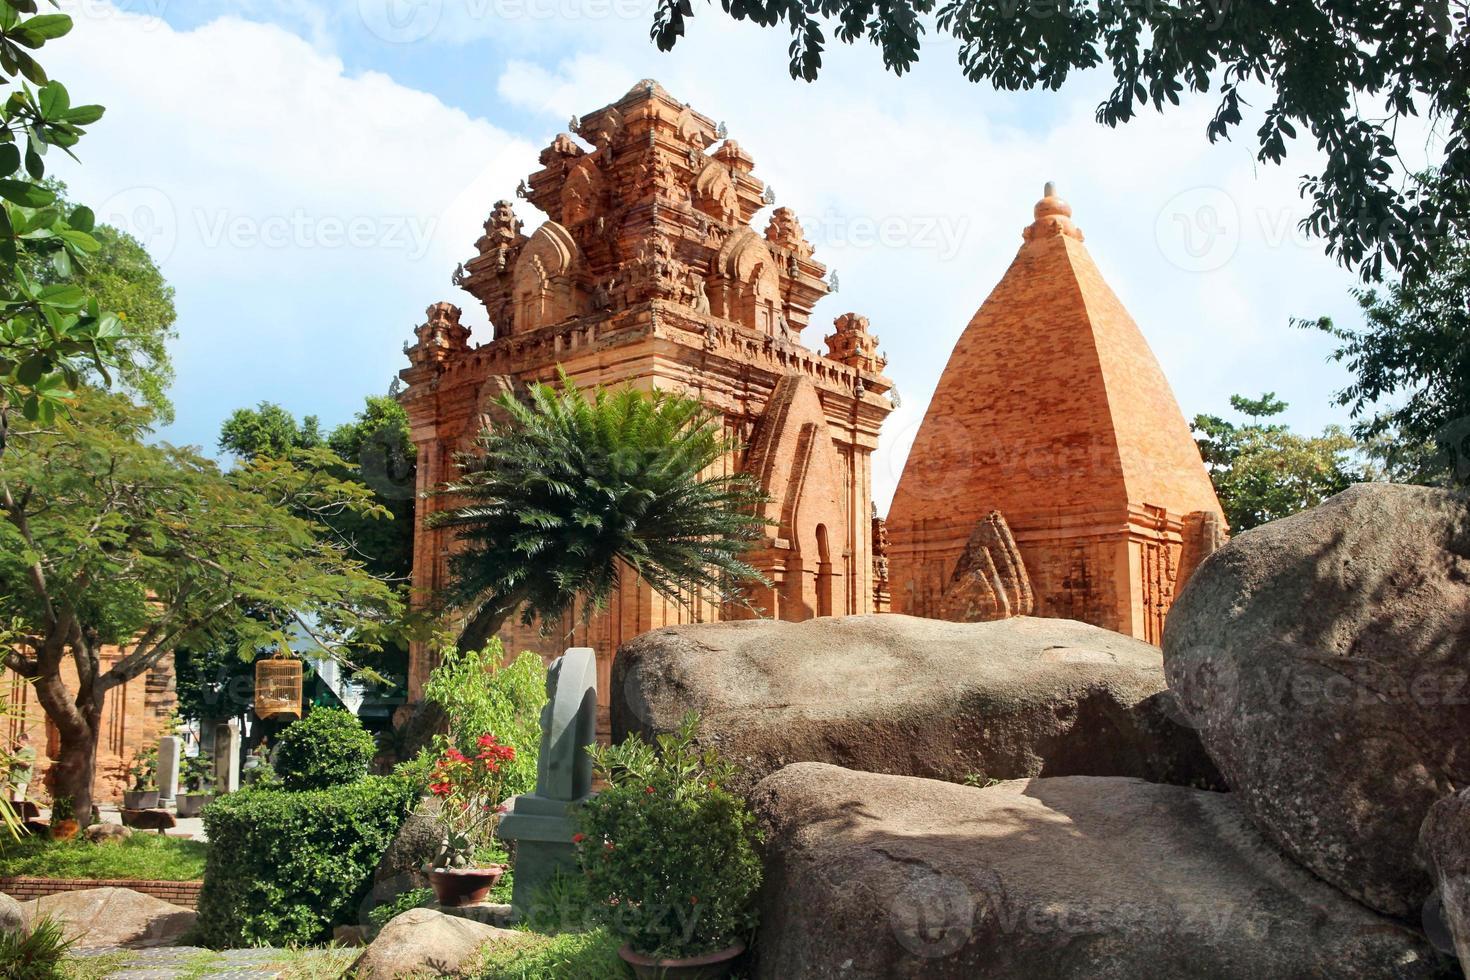 Türme cham Zivilisation. nha trang, vietnam foto